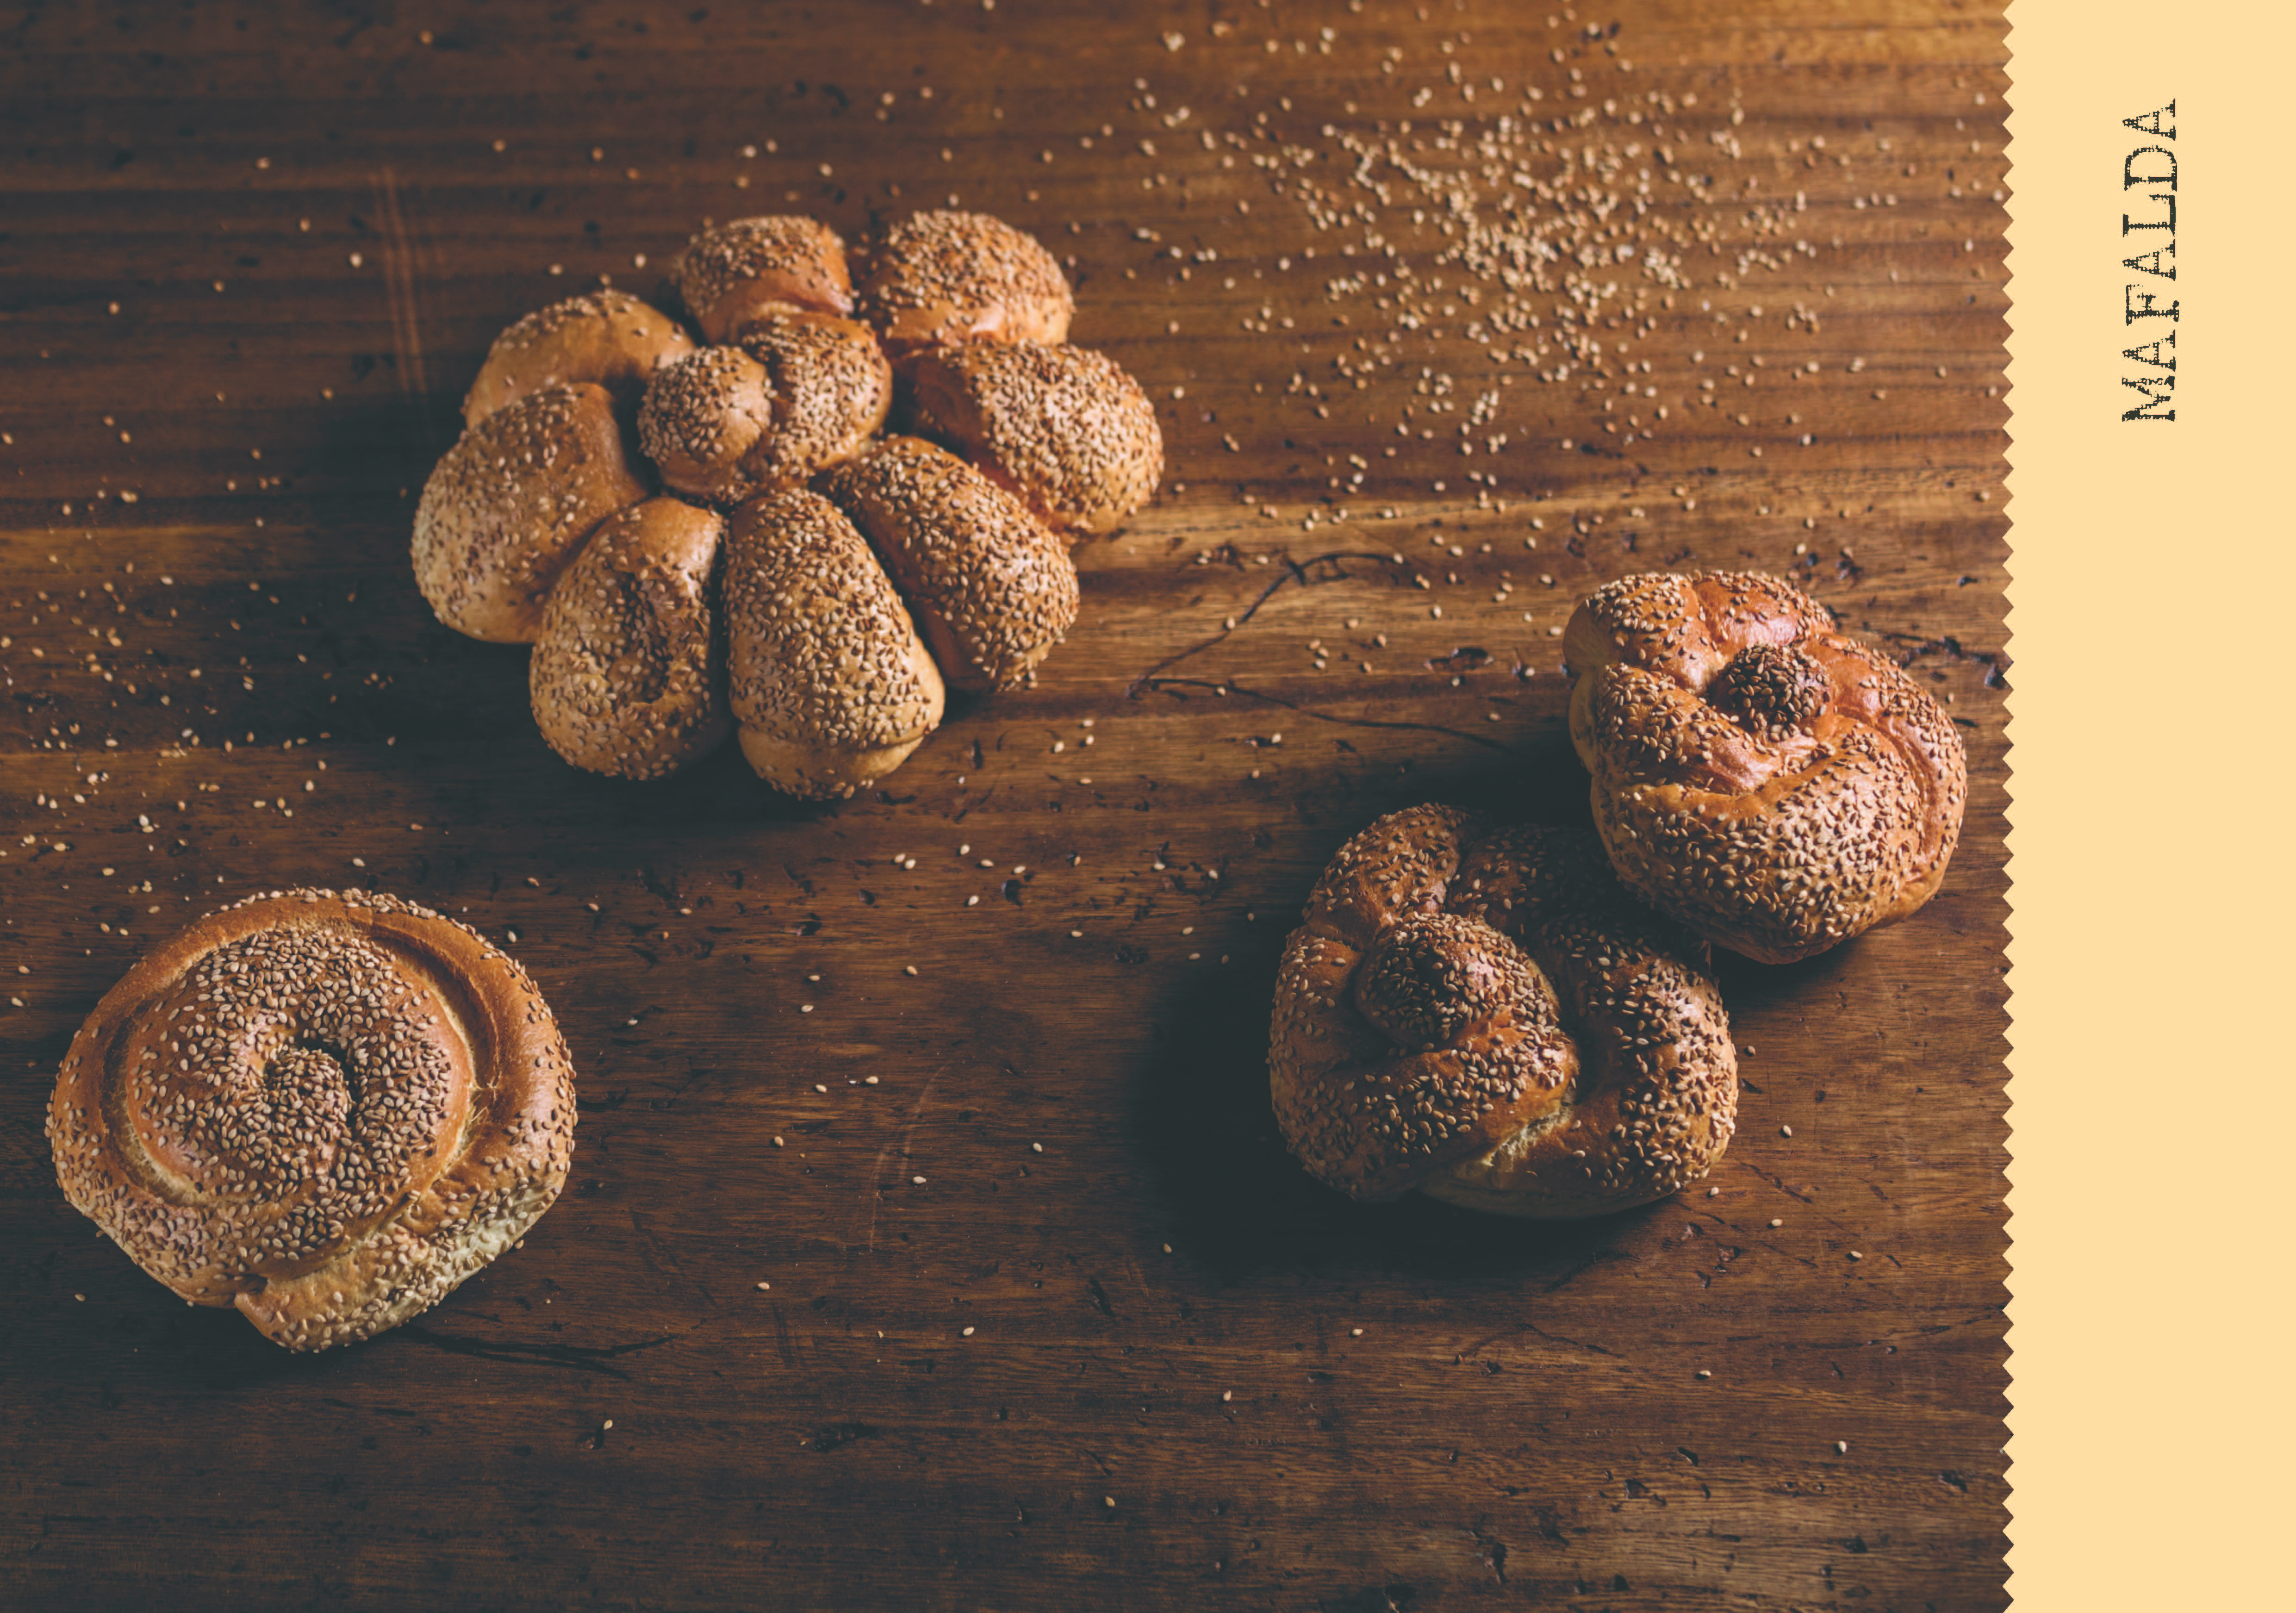 La bontà del pane